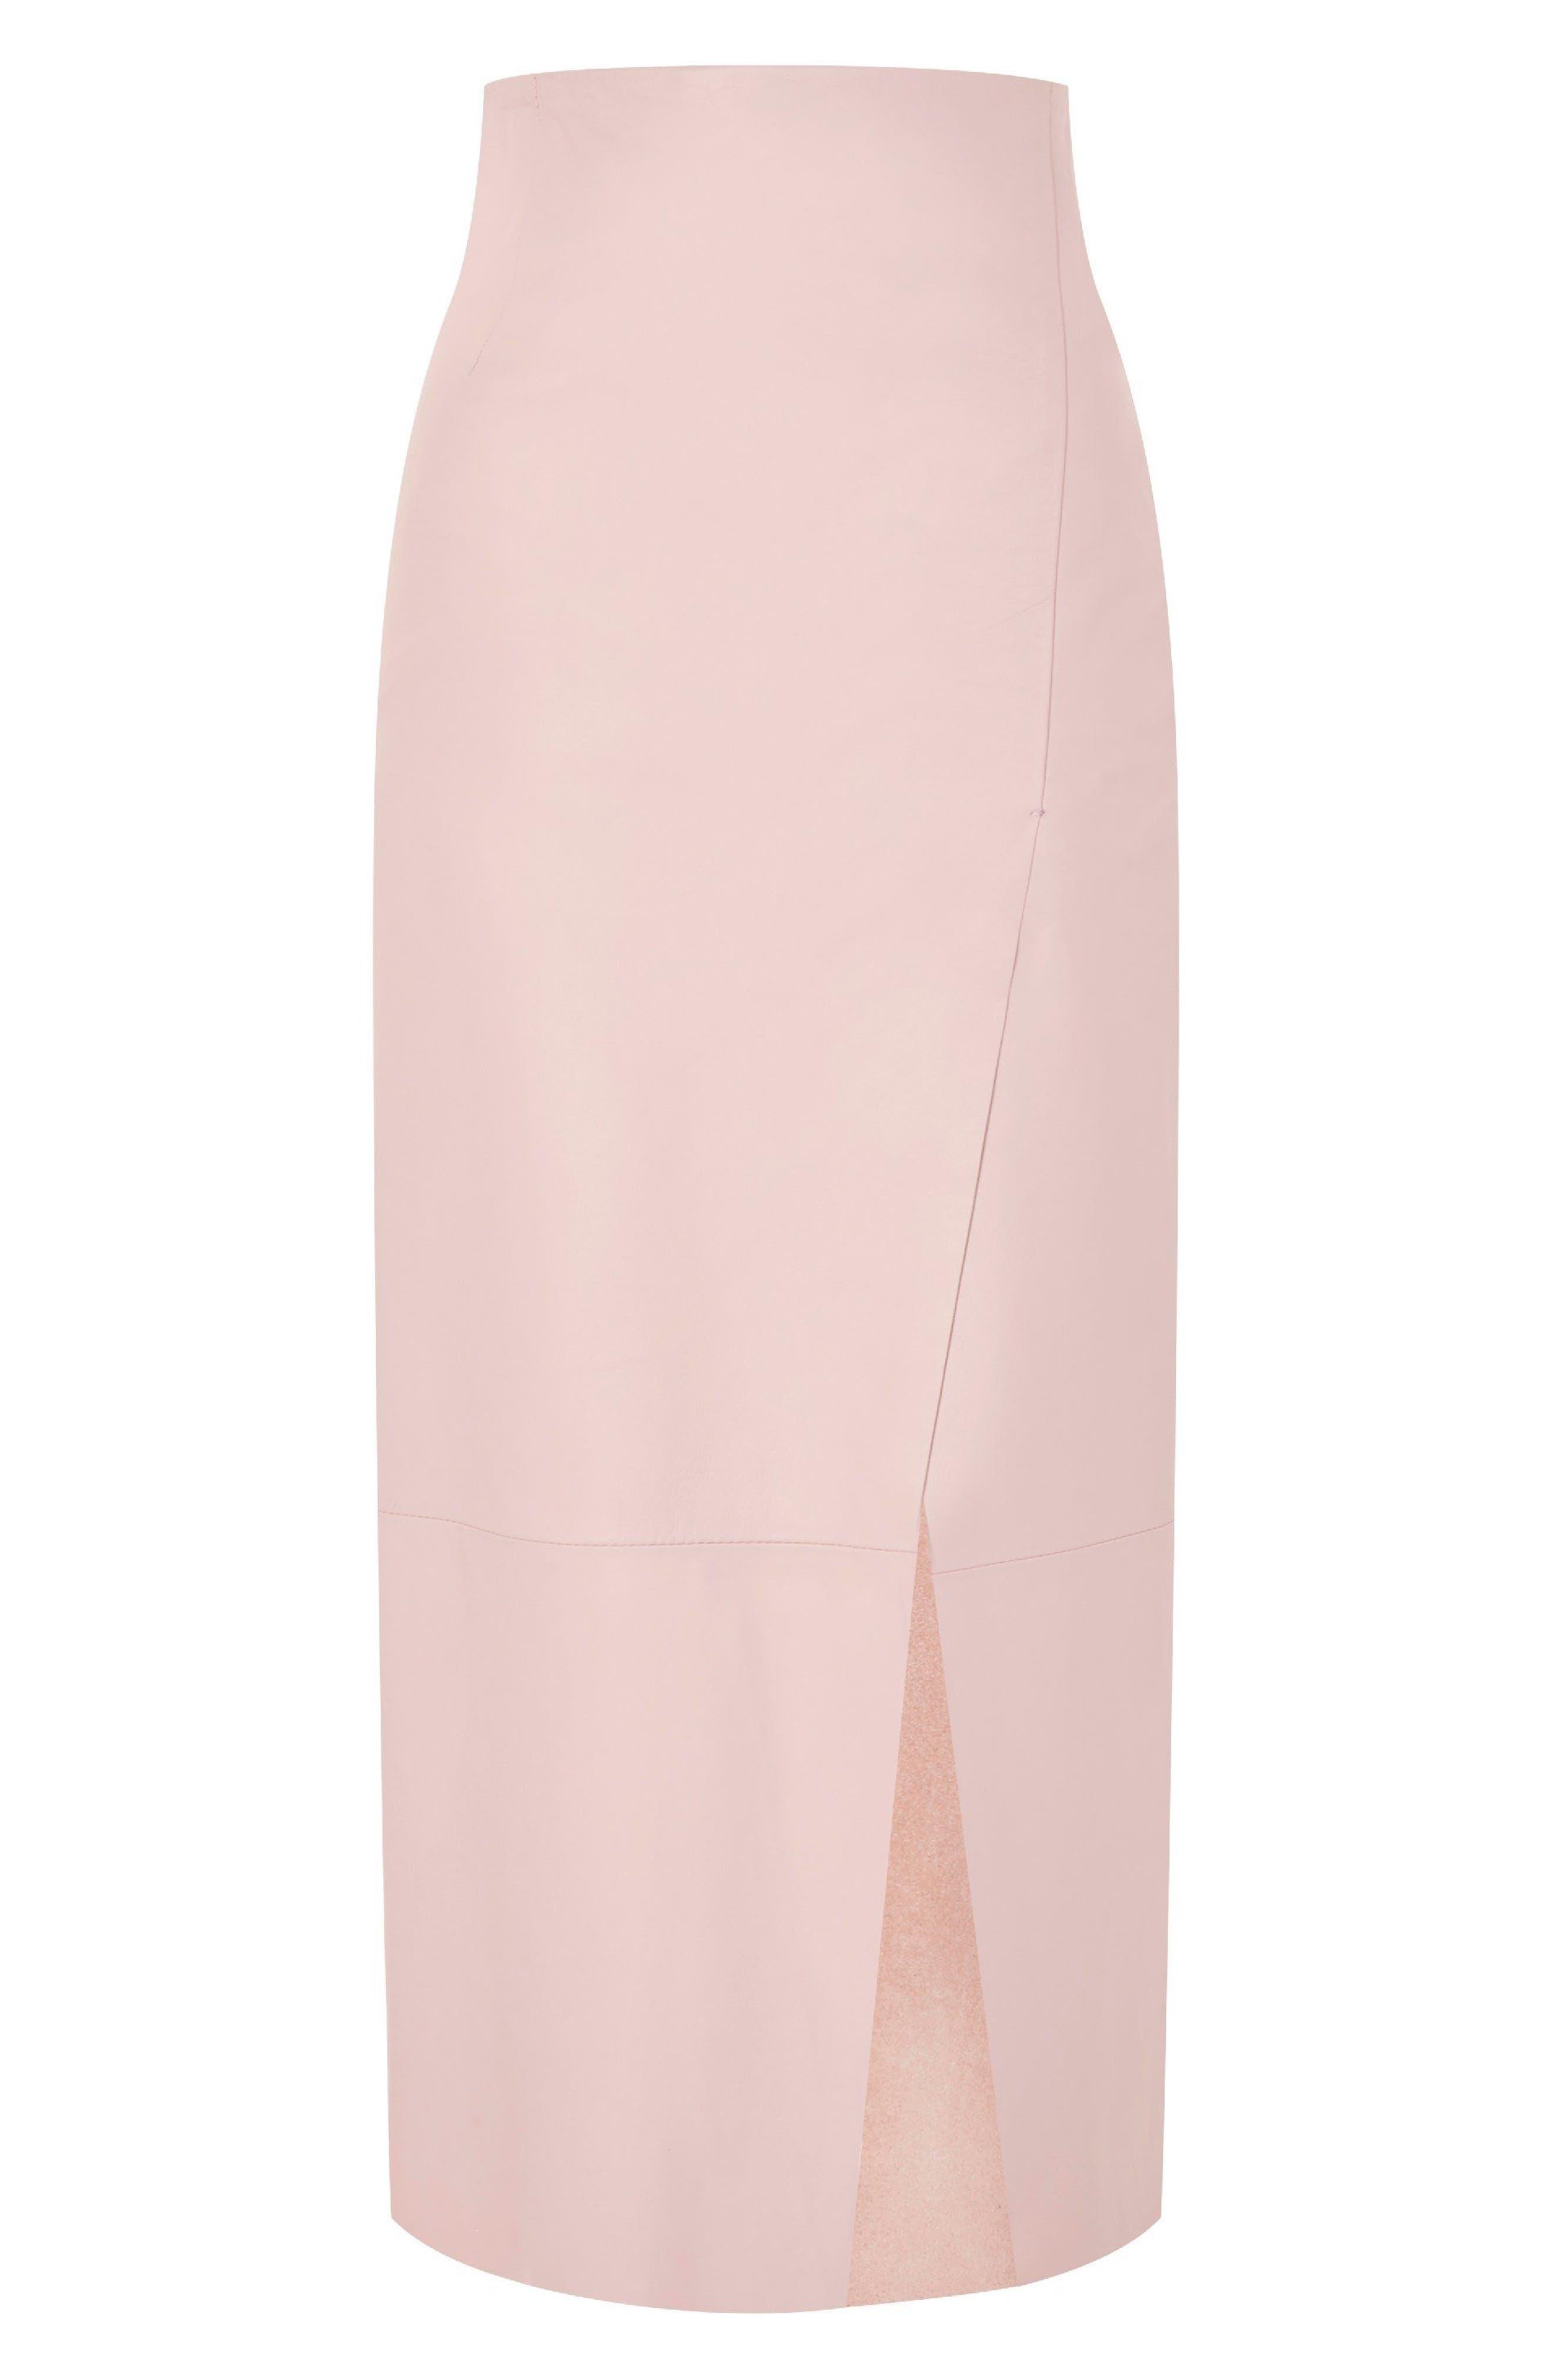 Topshop Boutique Leather Split Midi Skirt